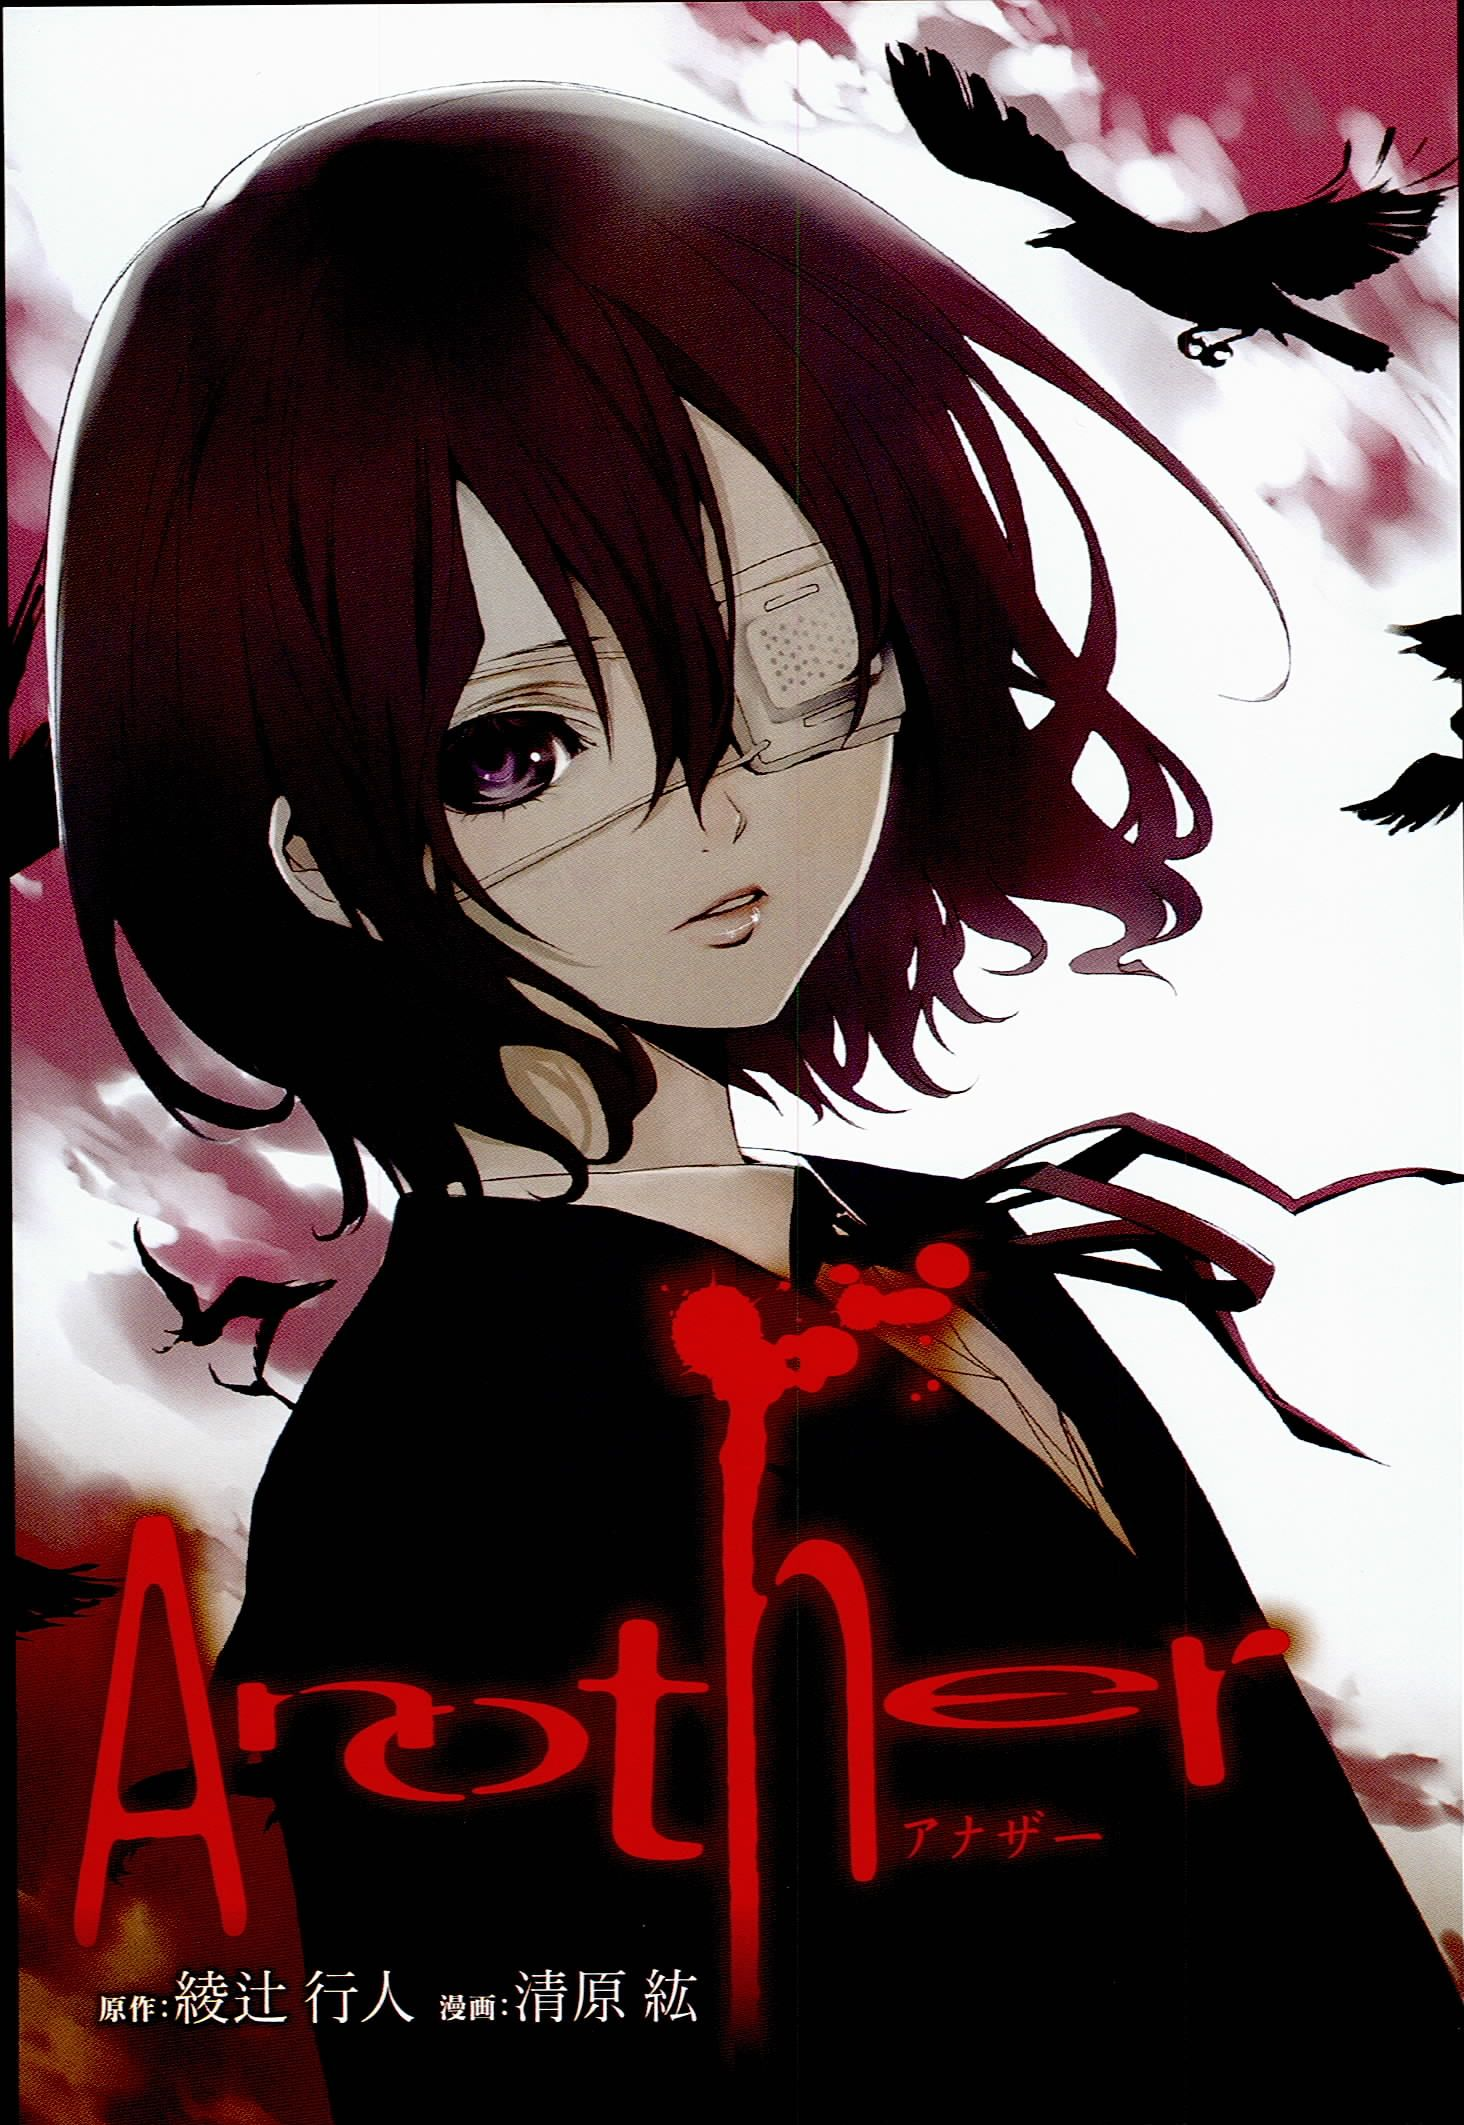 Tags Anime Kiyohara Hiro Another Misaki Mei Official Art Mobile